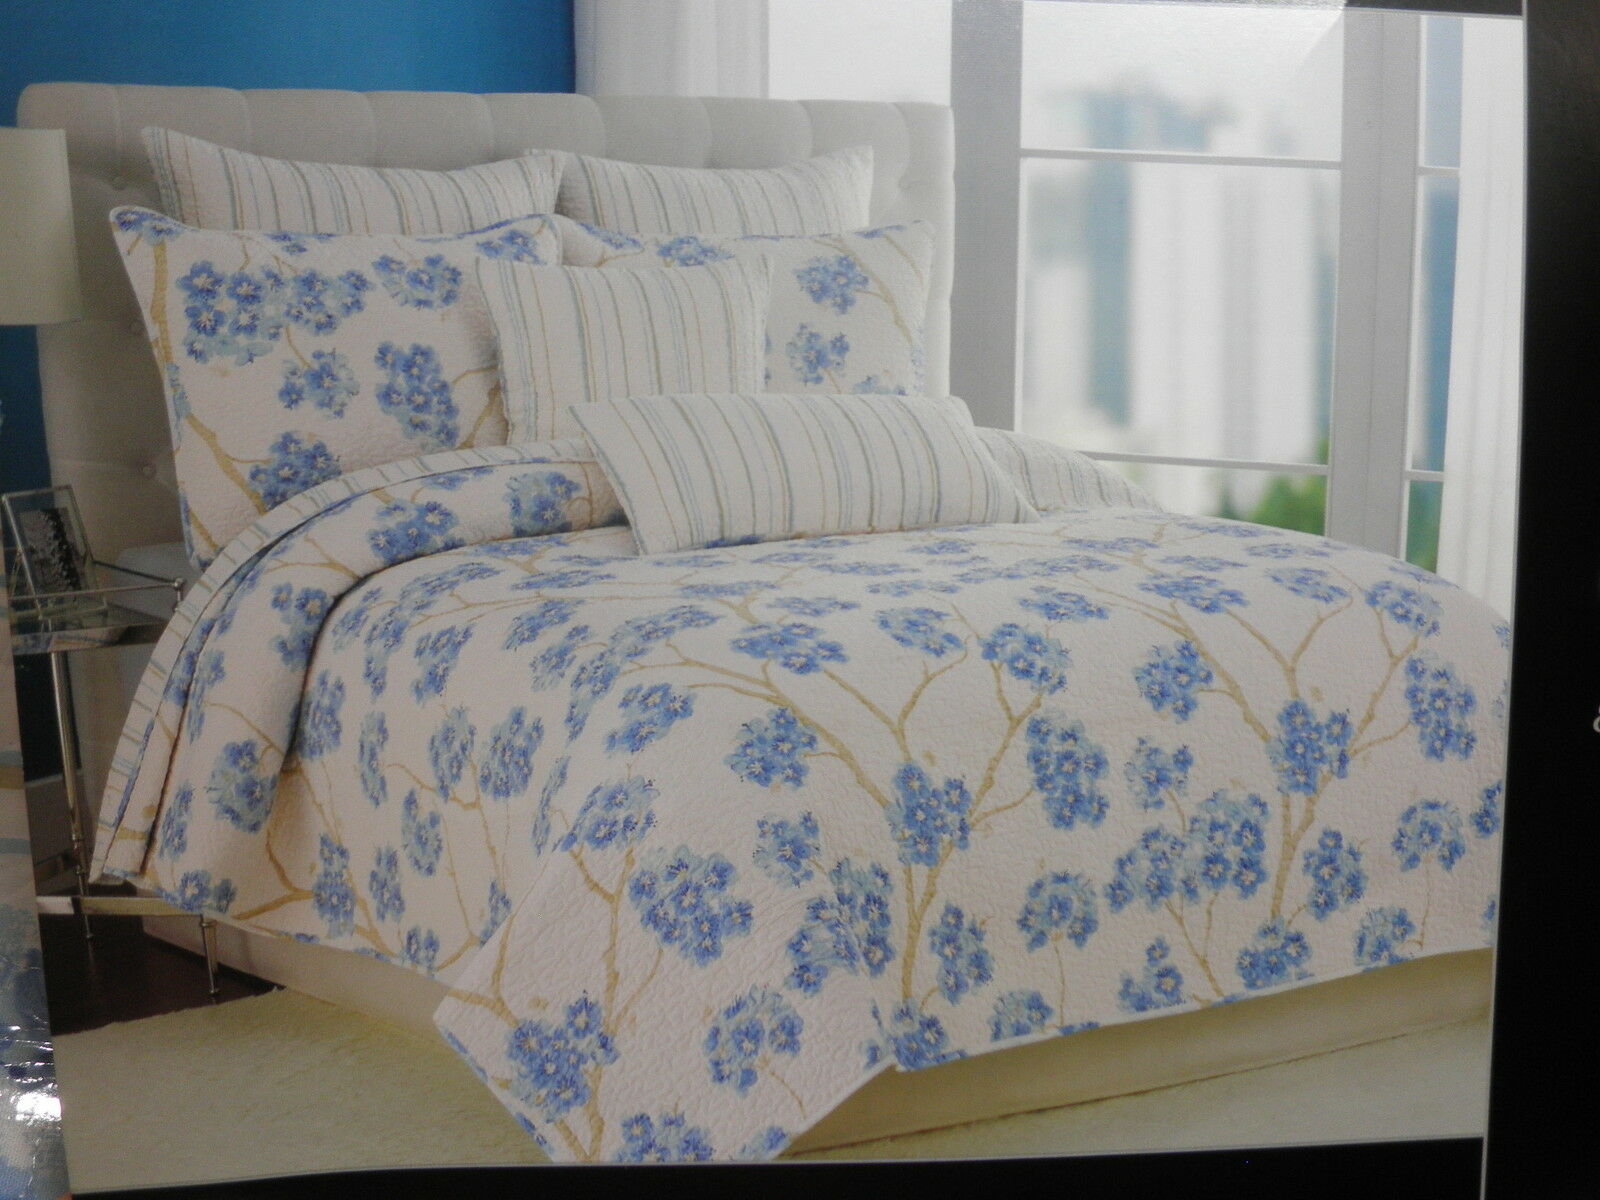 New Nicole Miller Home Reversible Flower & Stripe Full Queen Quilt  Blau Taupe